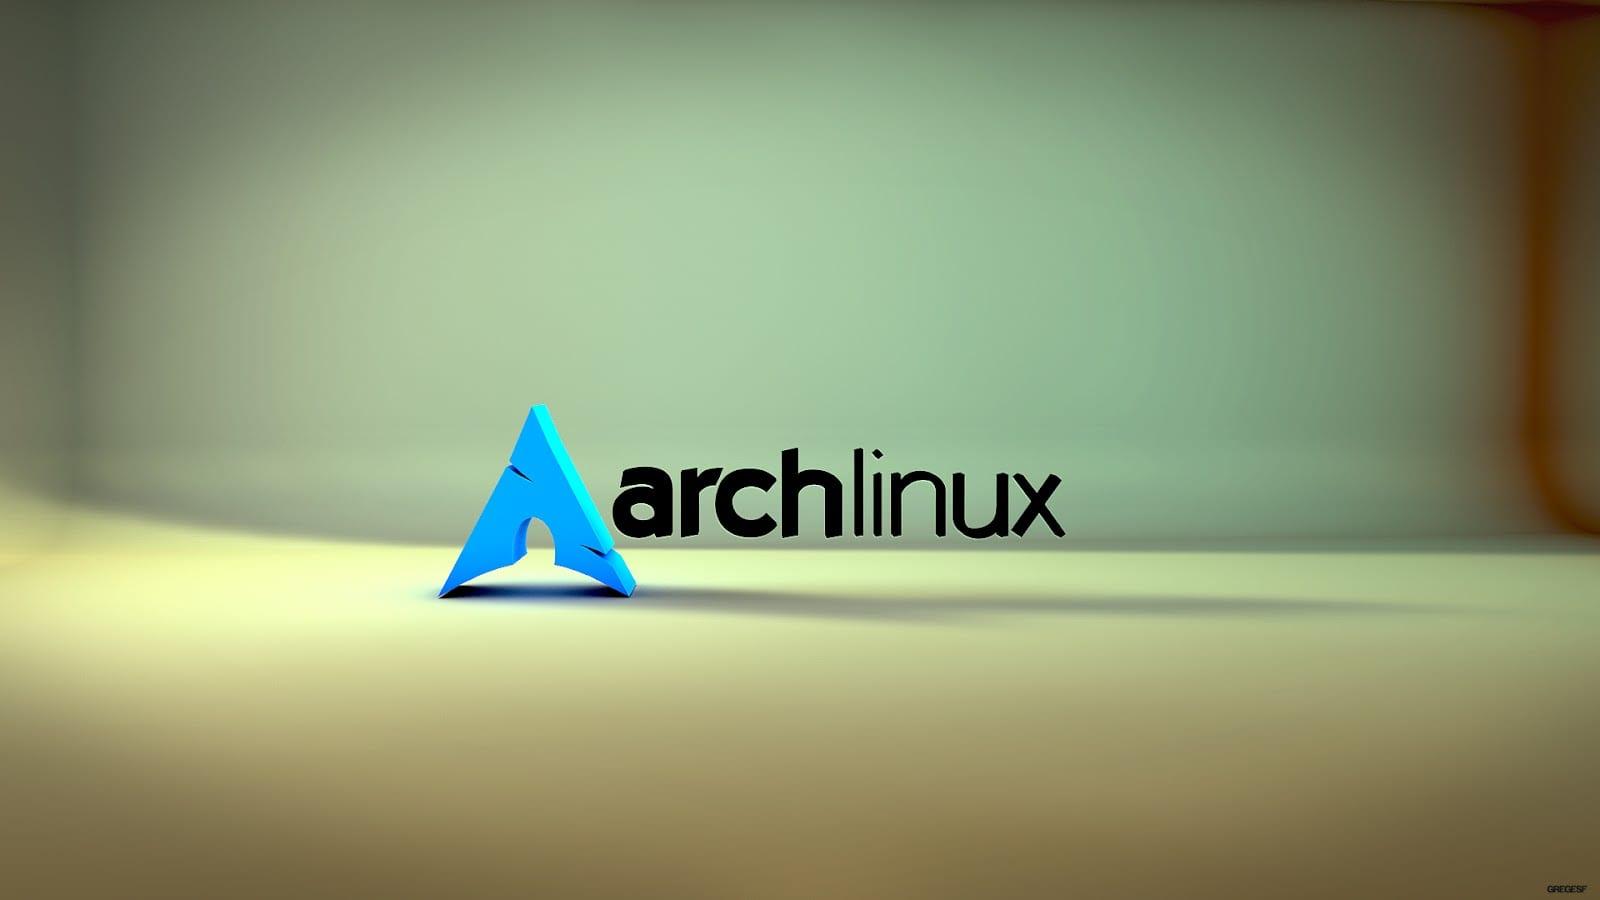 60_Wallpapers_Distribuciones_Linux_034